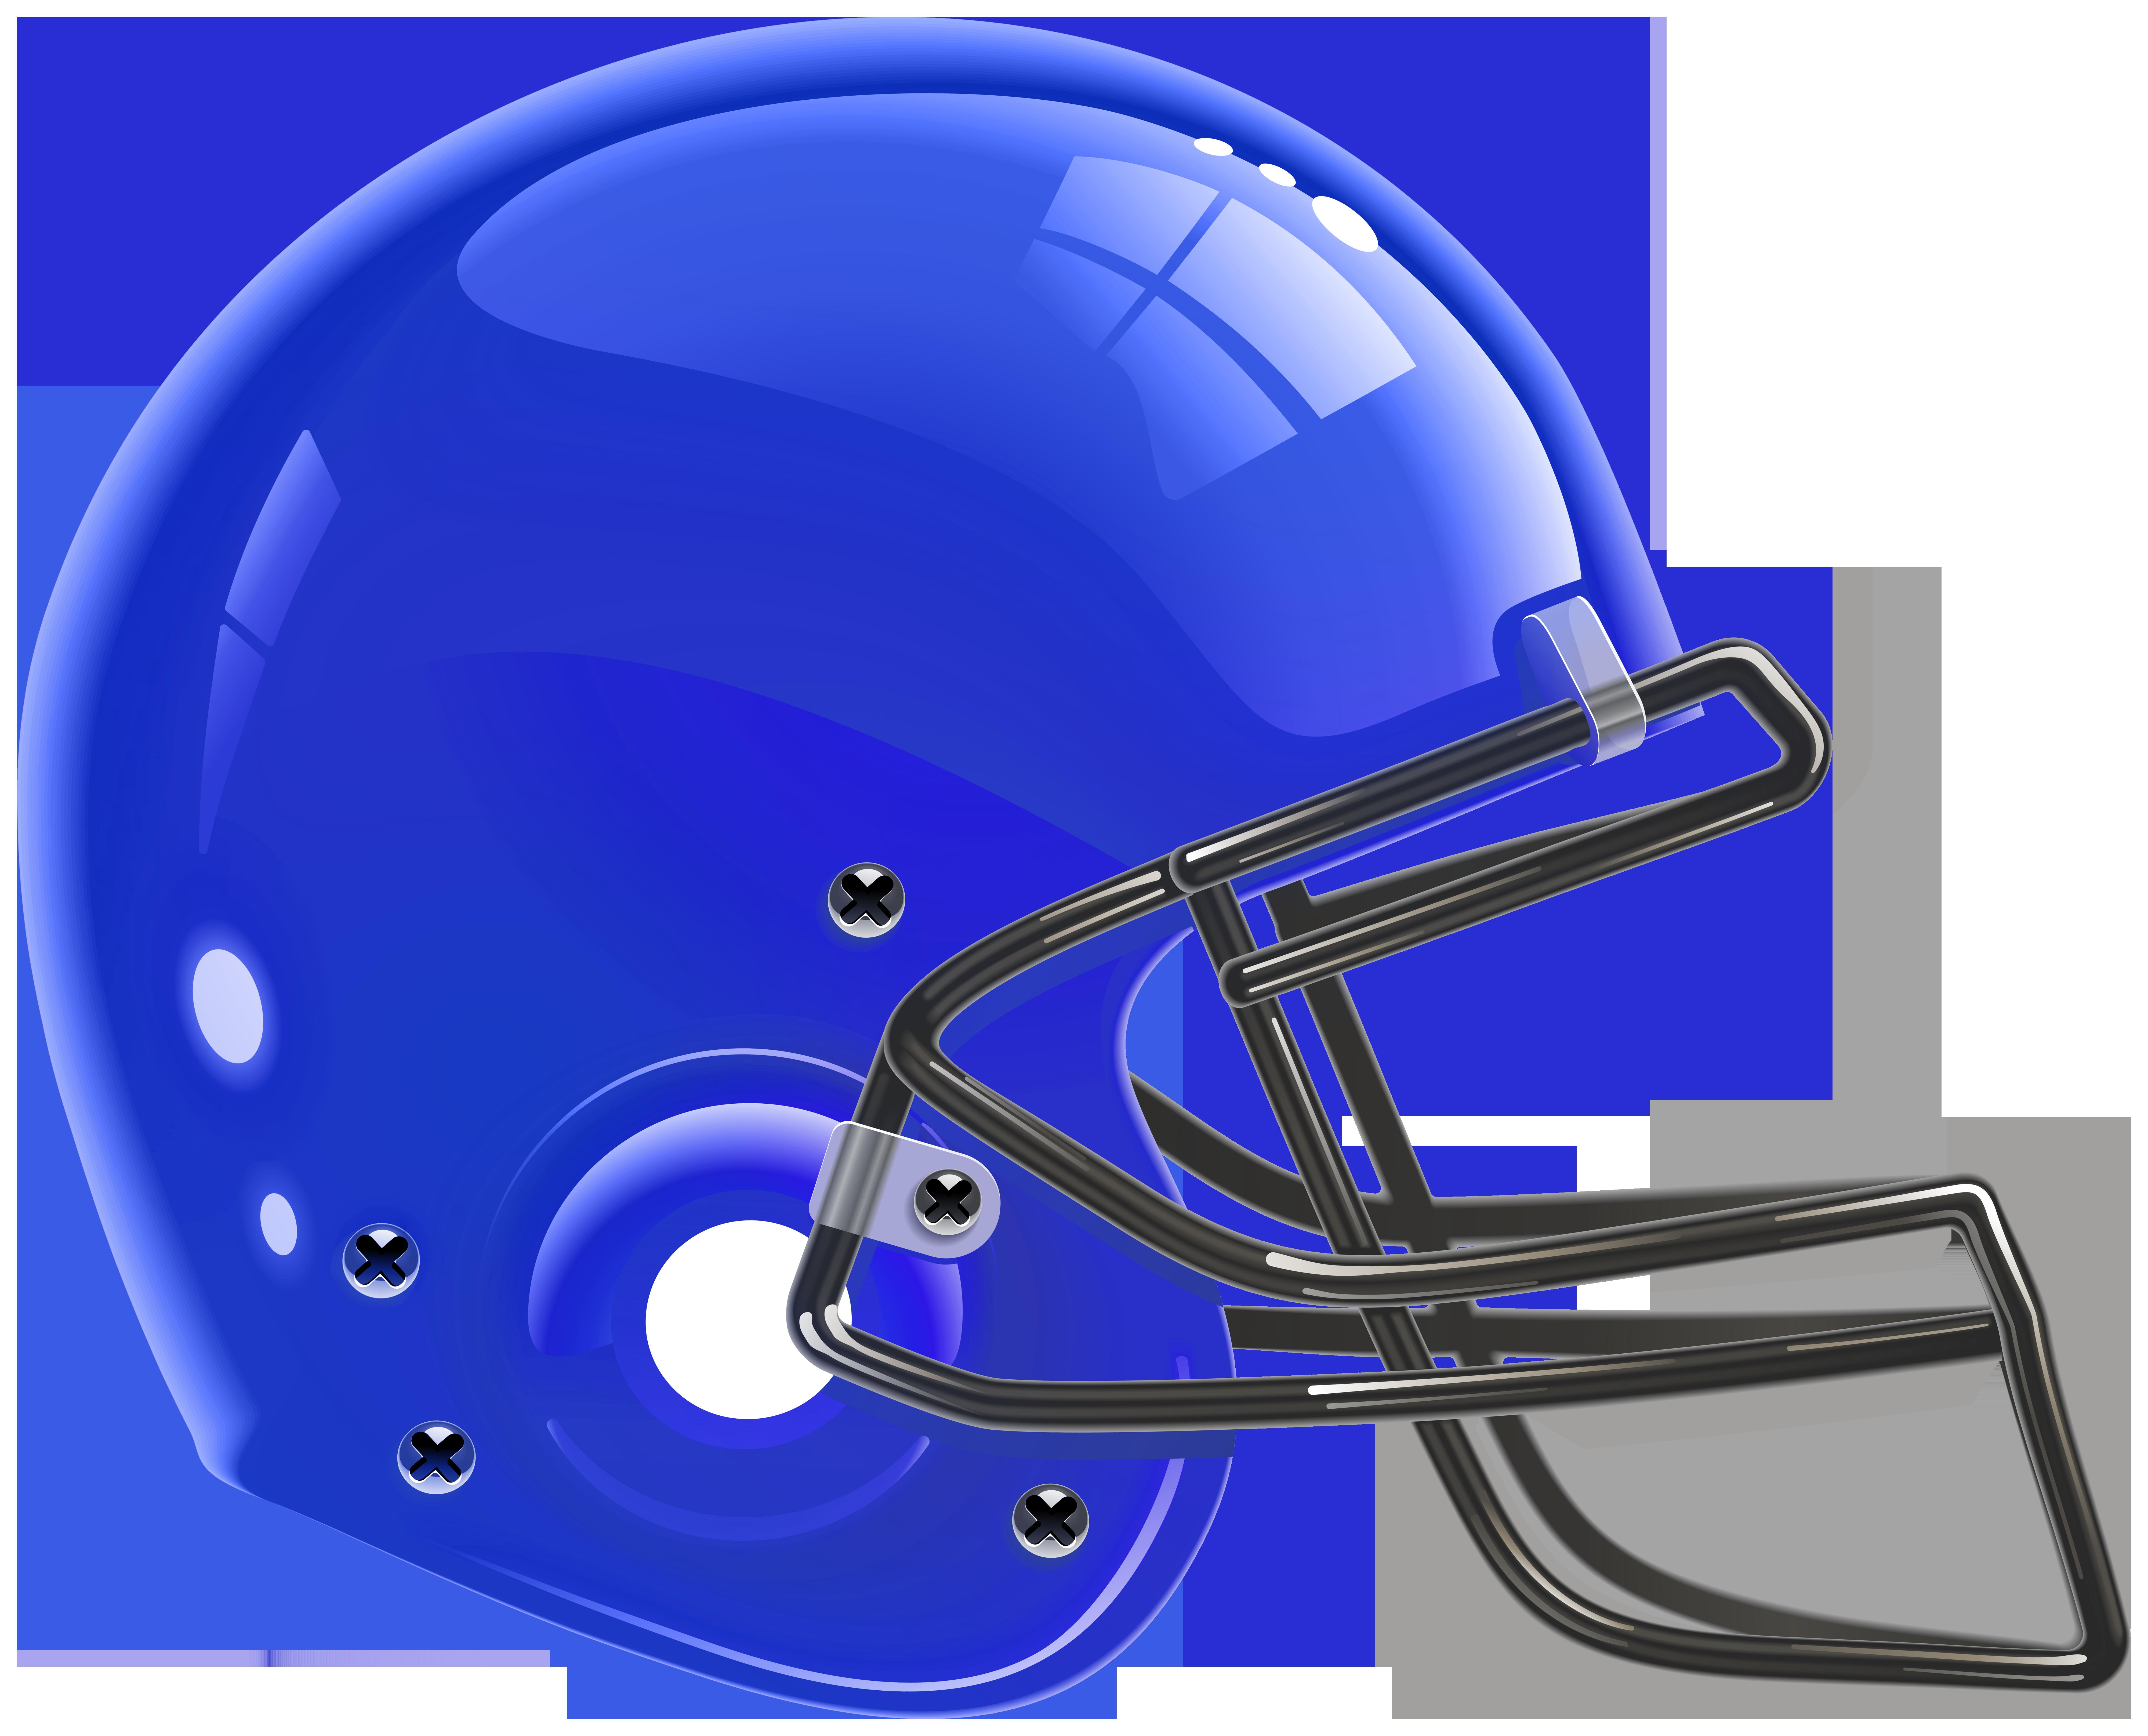 Blue helmet clipart black and white library Blue Football Helmet PNG Clip Art - Best WEB Clipart black and white library